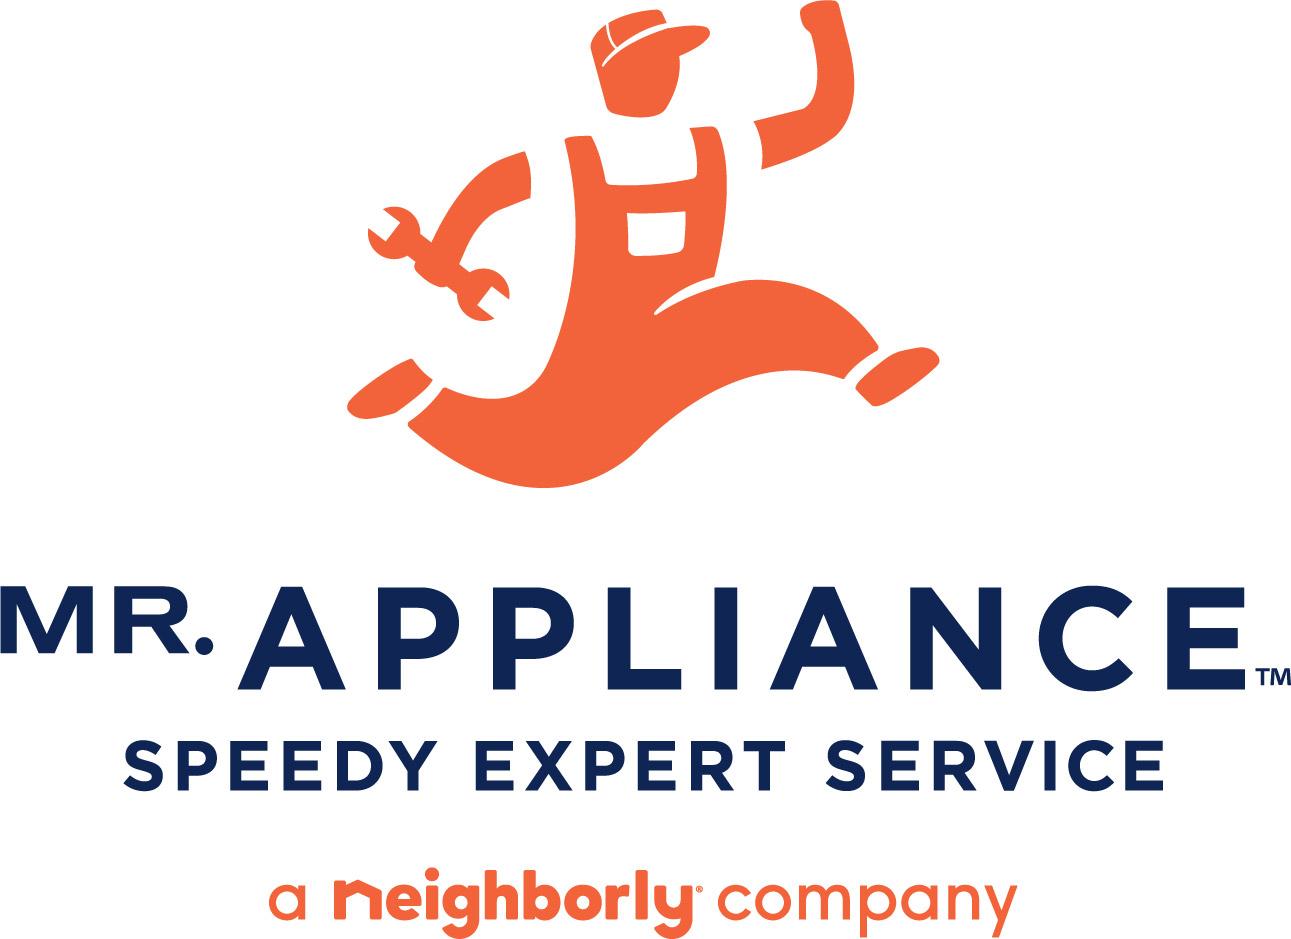 Mr. Appliance of Rancho Cucamonga